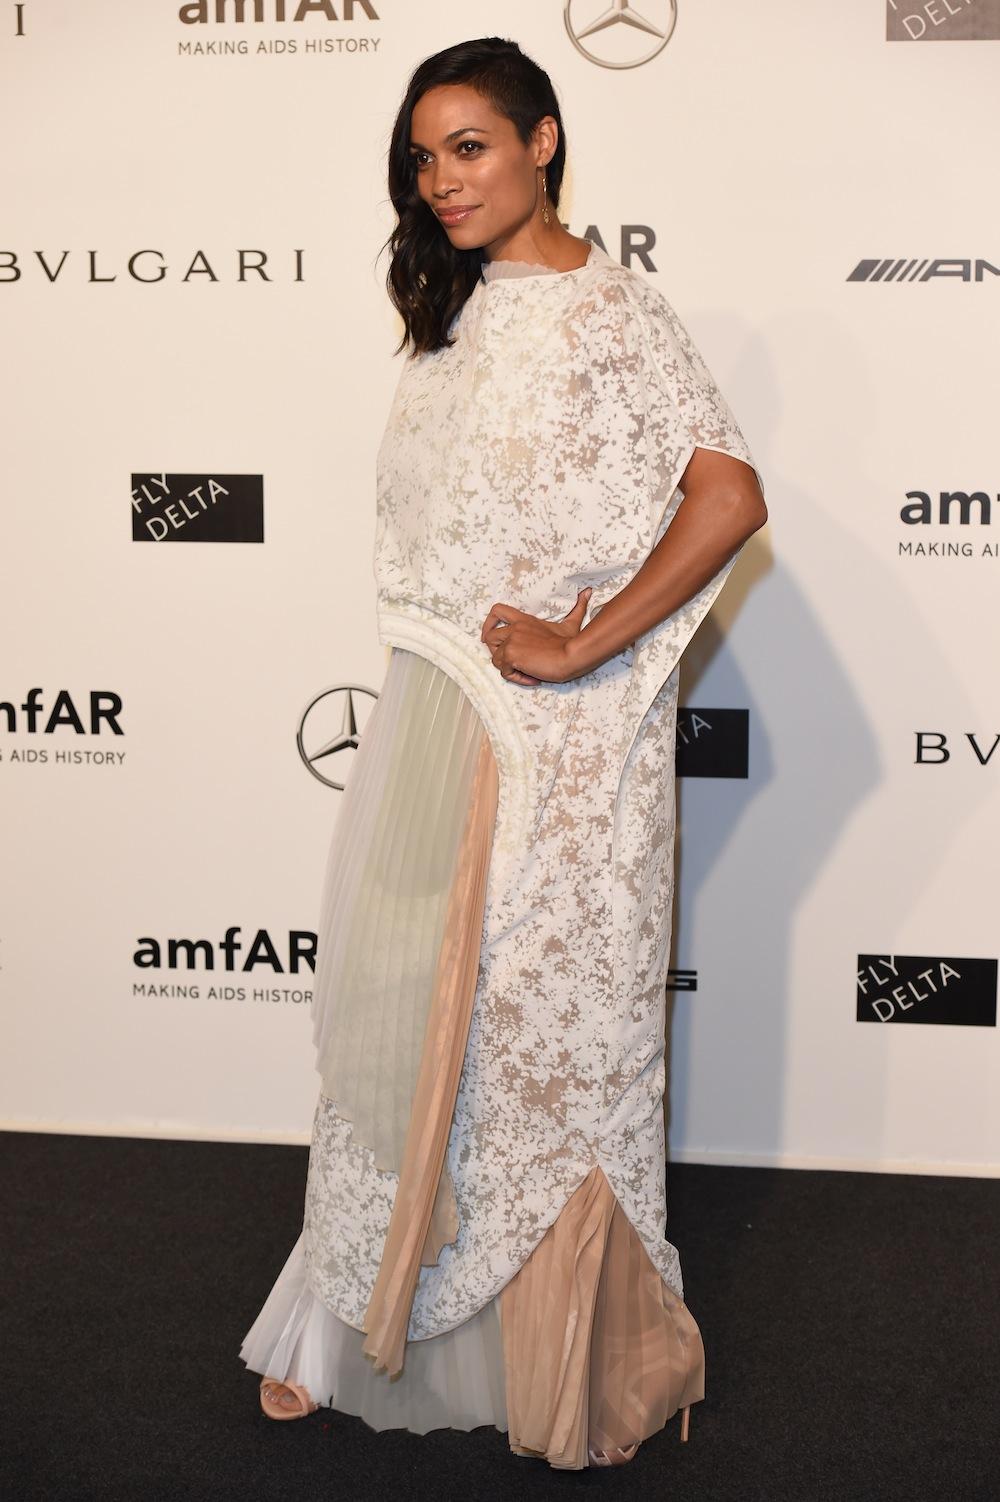 amfAR Milano 2014 - Arrivals - Milan Fashion Week Womenswear Spring/Summer 2015